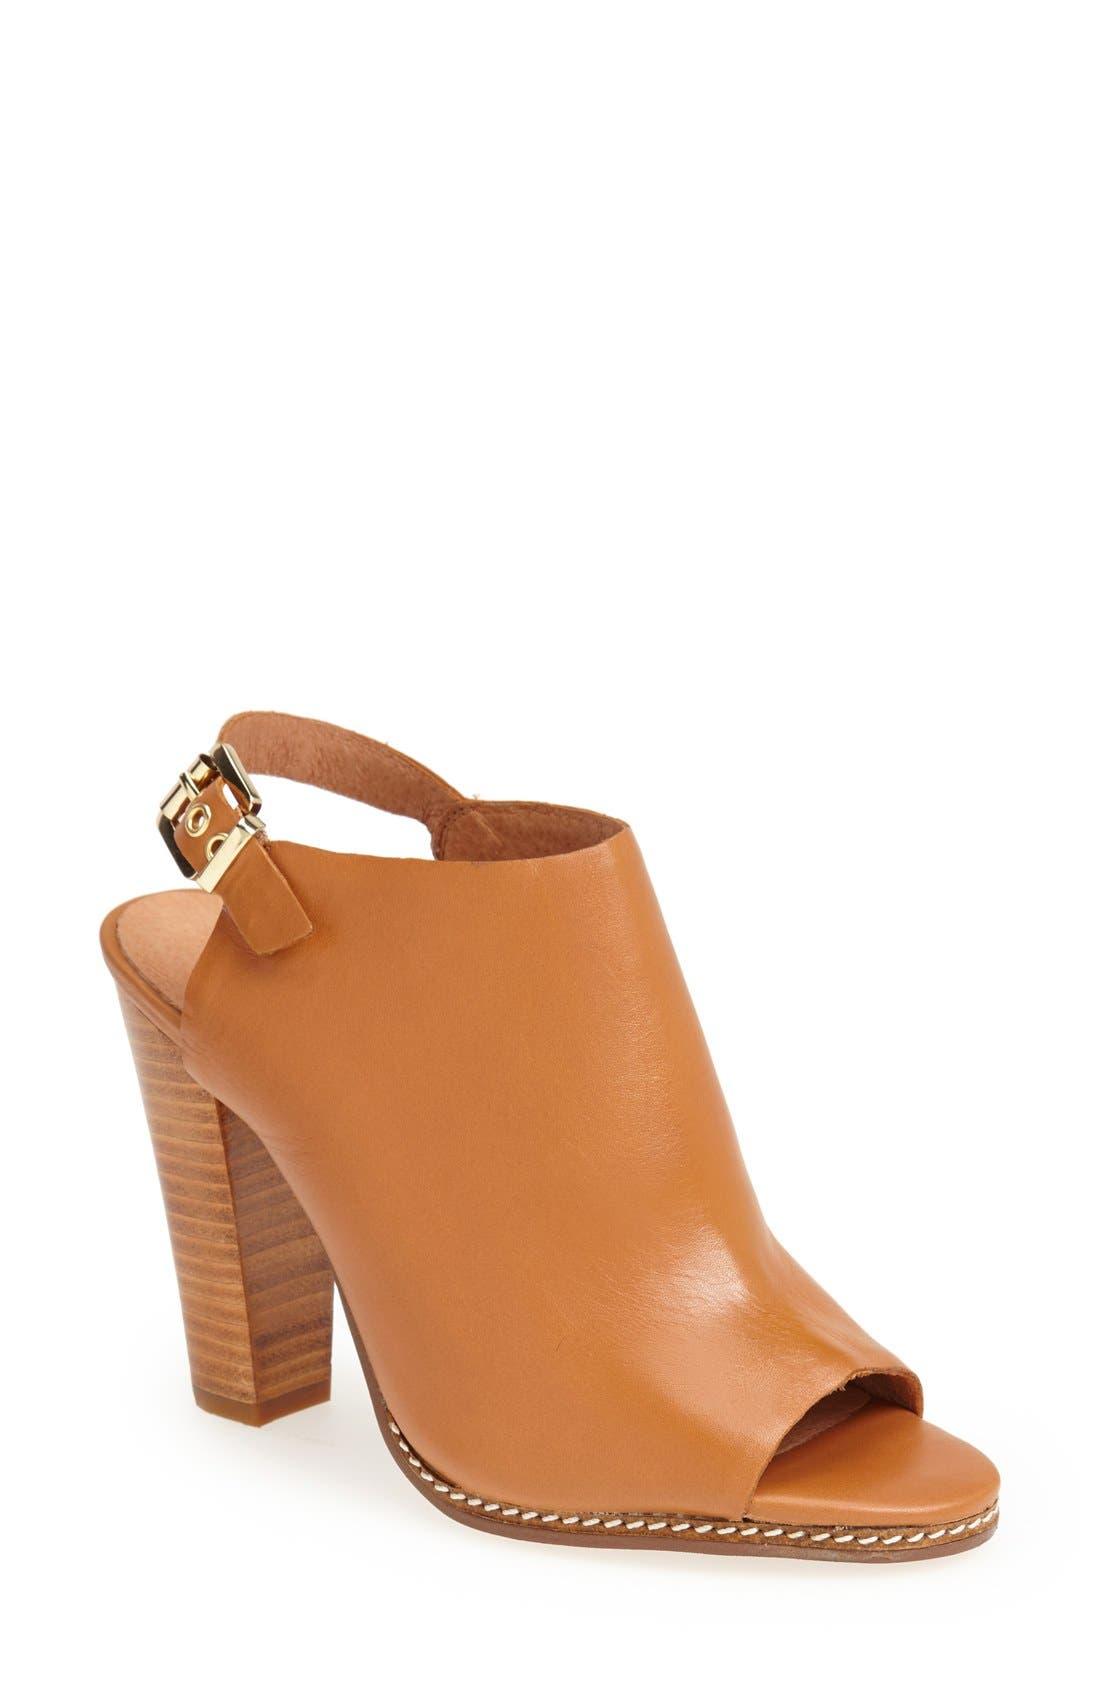 Alternate Image 1 Selected - Halogen 'Sasha' Leather Sandal (Women)